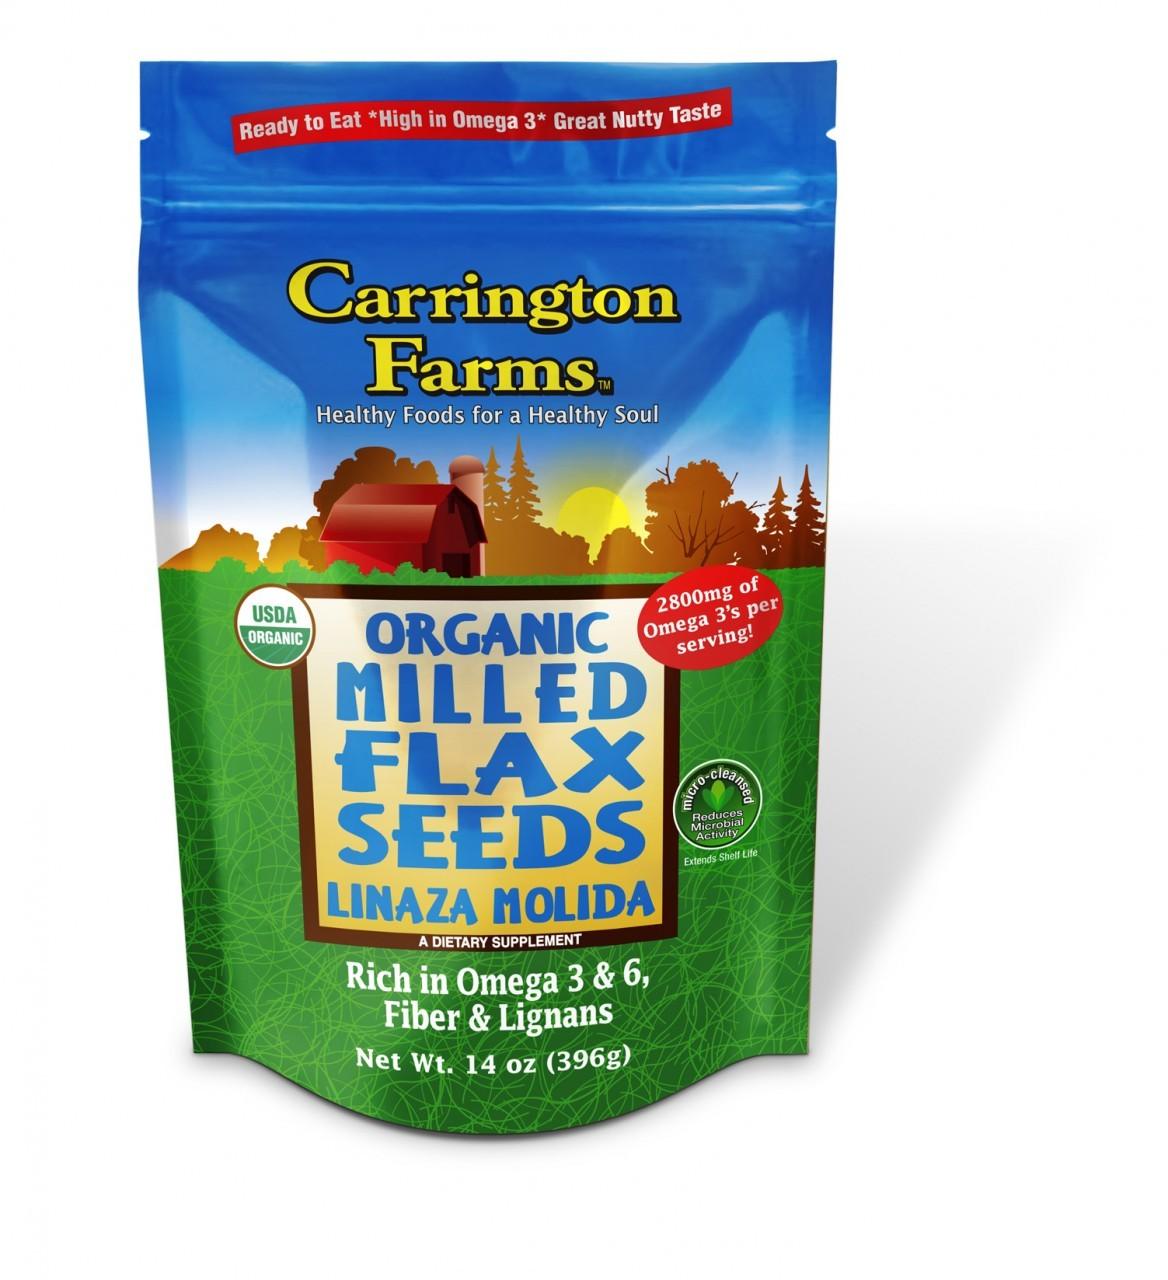 c-14-oz-organic-milled-flax.jpg